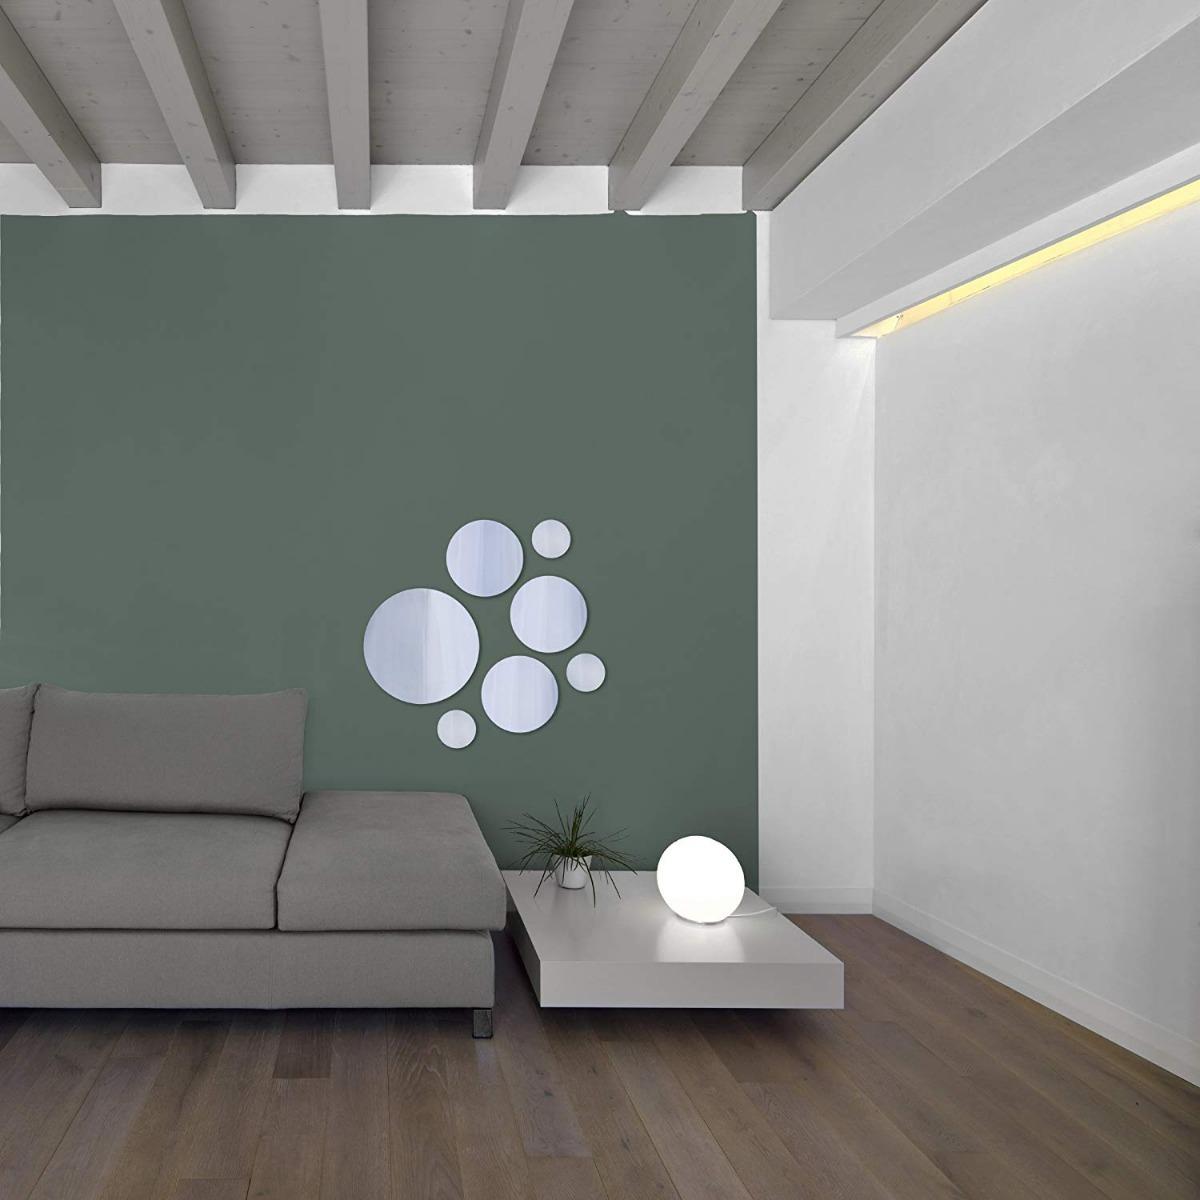 fotos de espejos decorativos para salas Set 7 Pzas Espejos Decorativos Redondos De Vidrio Ligeros Para Pared Fcil Instalacin Ideal Para Bao Recamara Sala